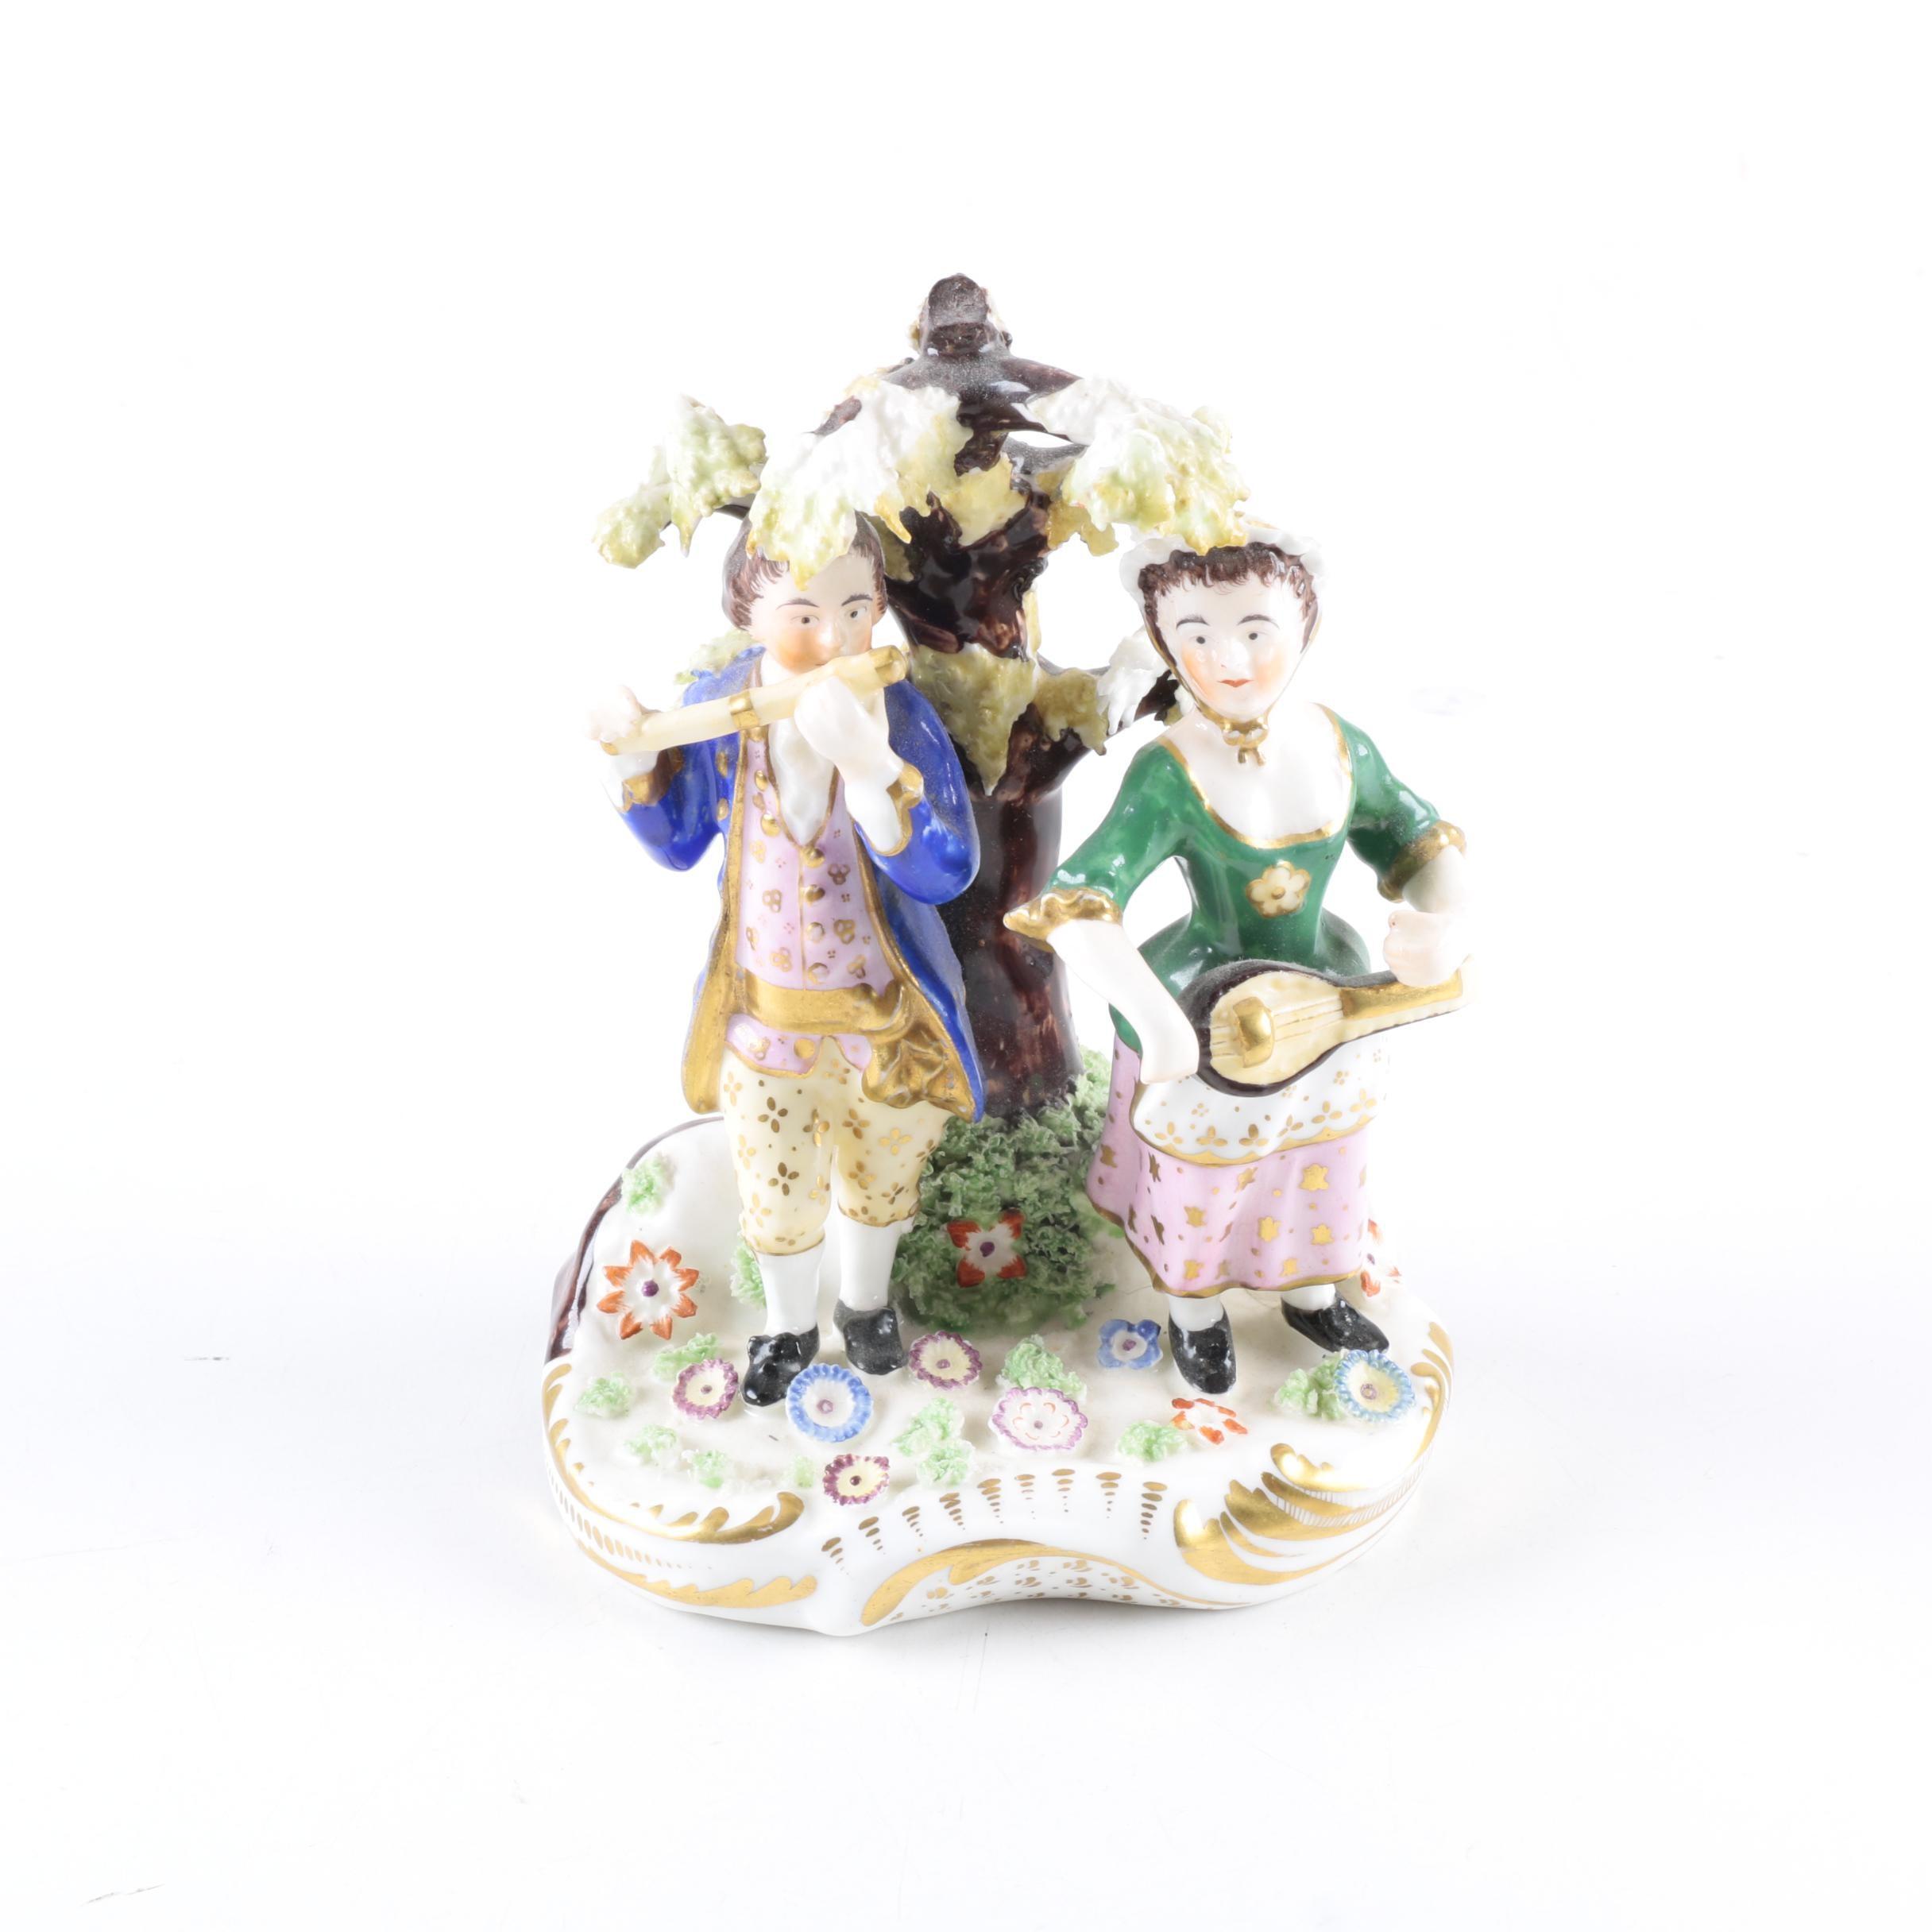 Decorative Porcelain Figurine Depicting a Musical Scene